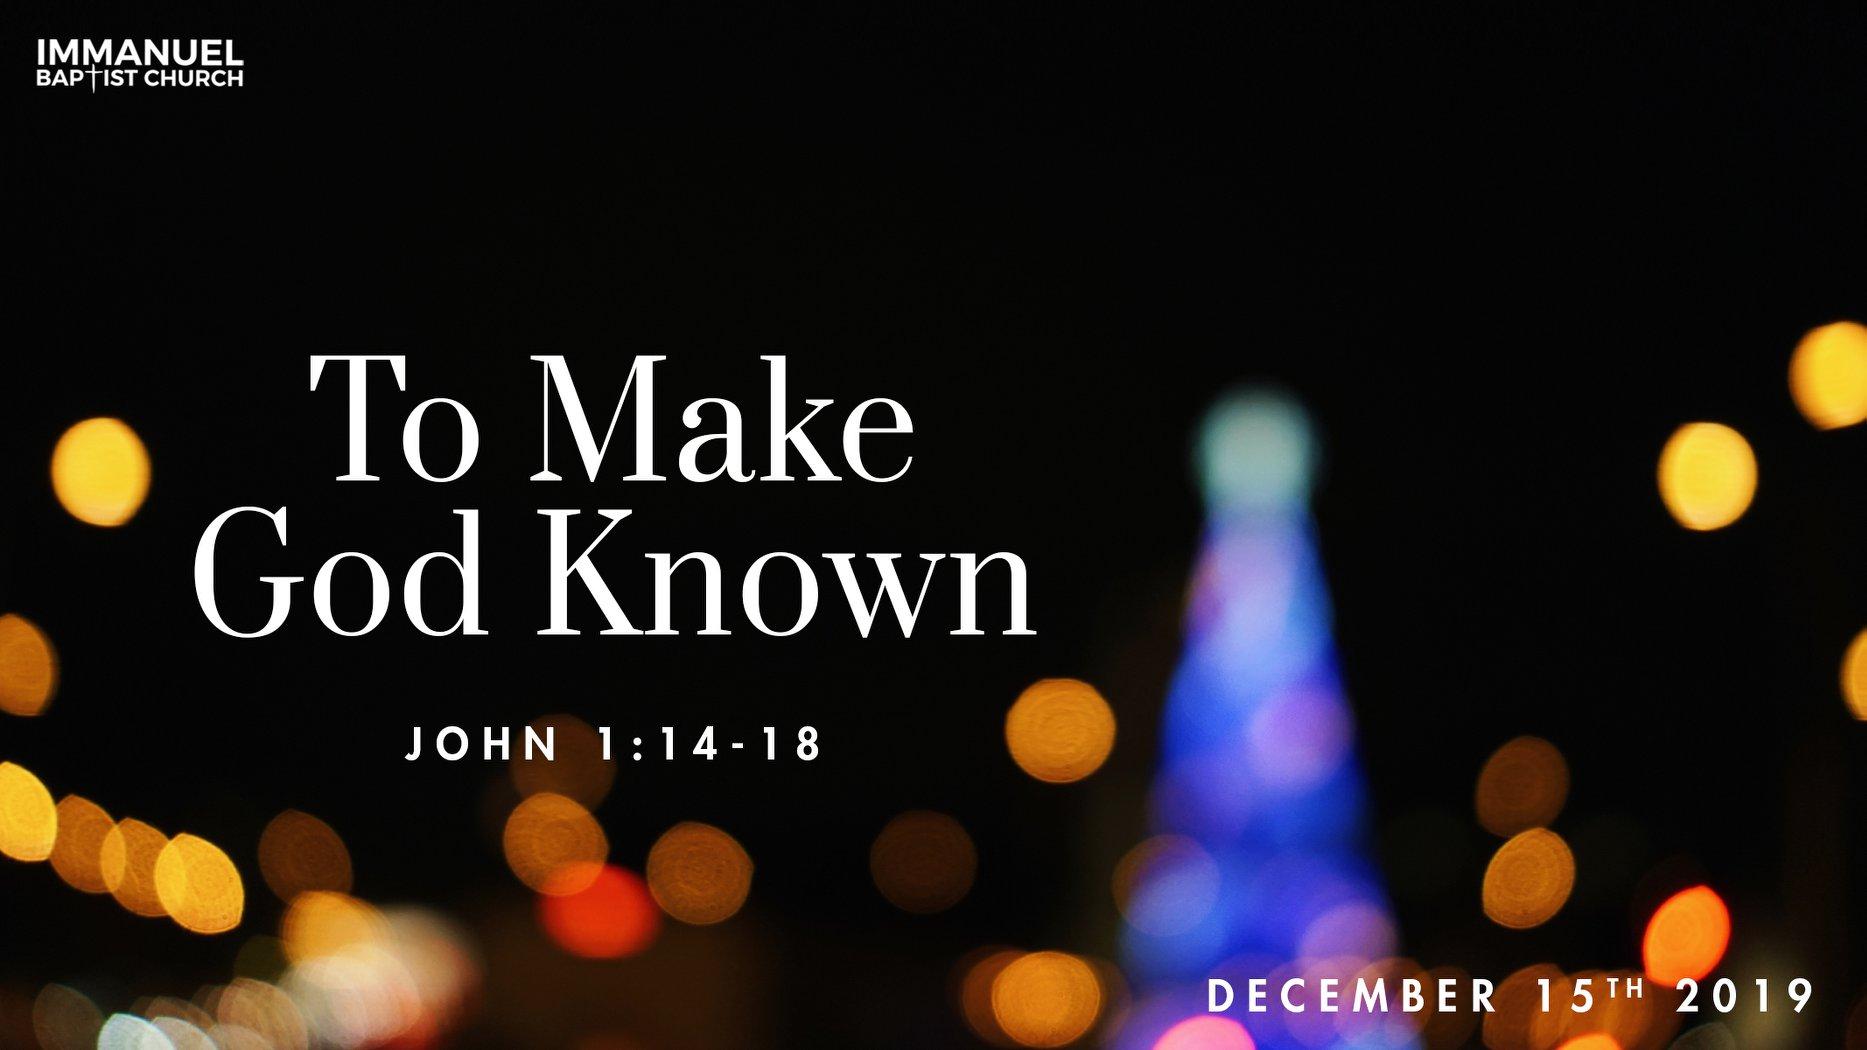 To Make God Known (John 1:14-18) Image